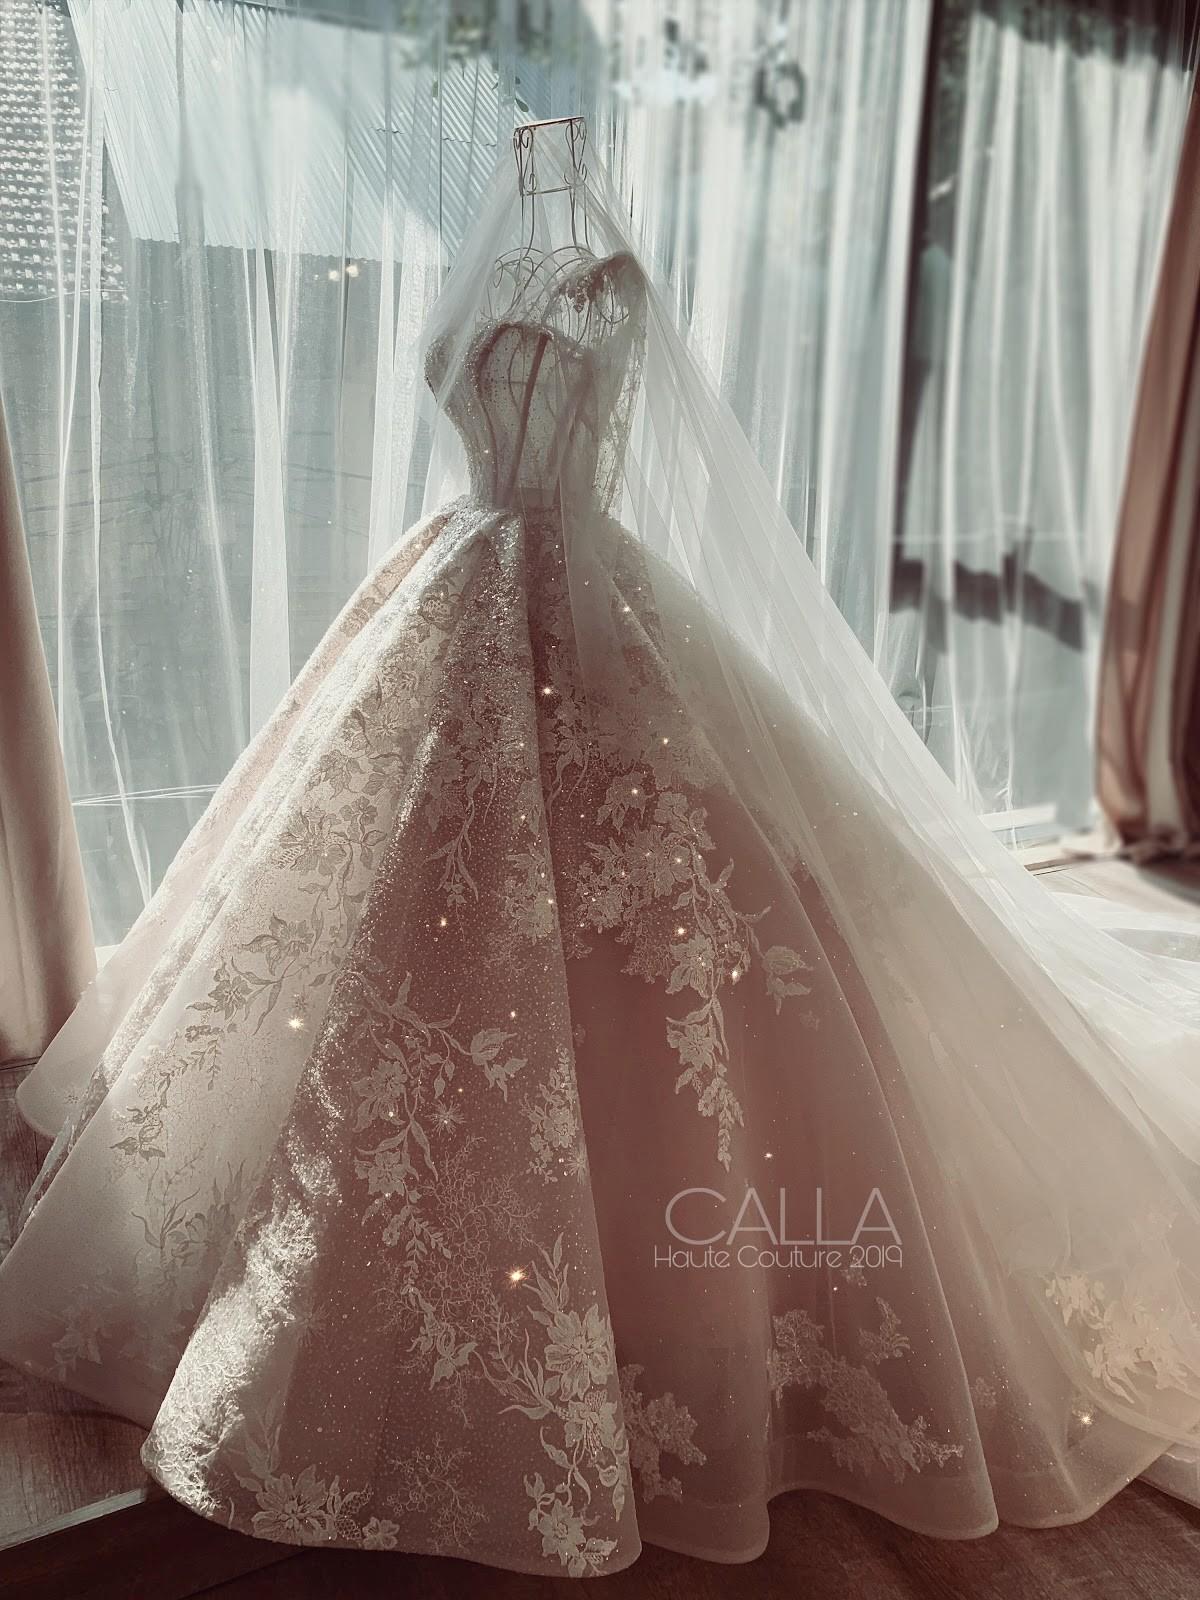 Calla Bridal ra mắt dòng sản phẩm cao cấp Calla Haute Couture 2019 - Ảnh 1.